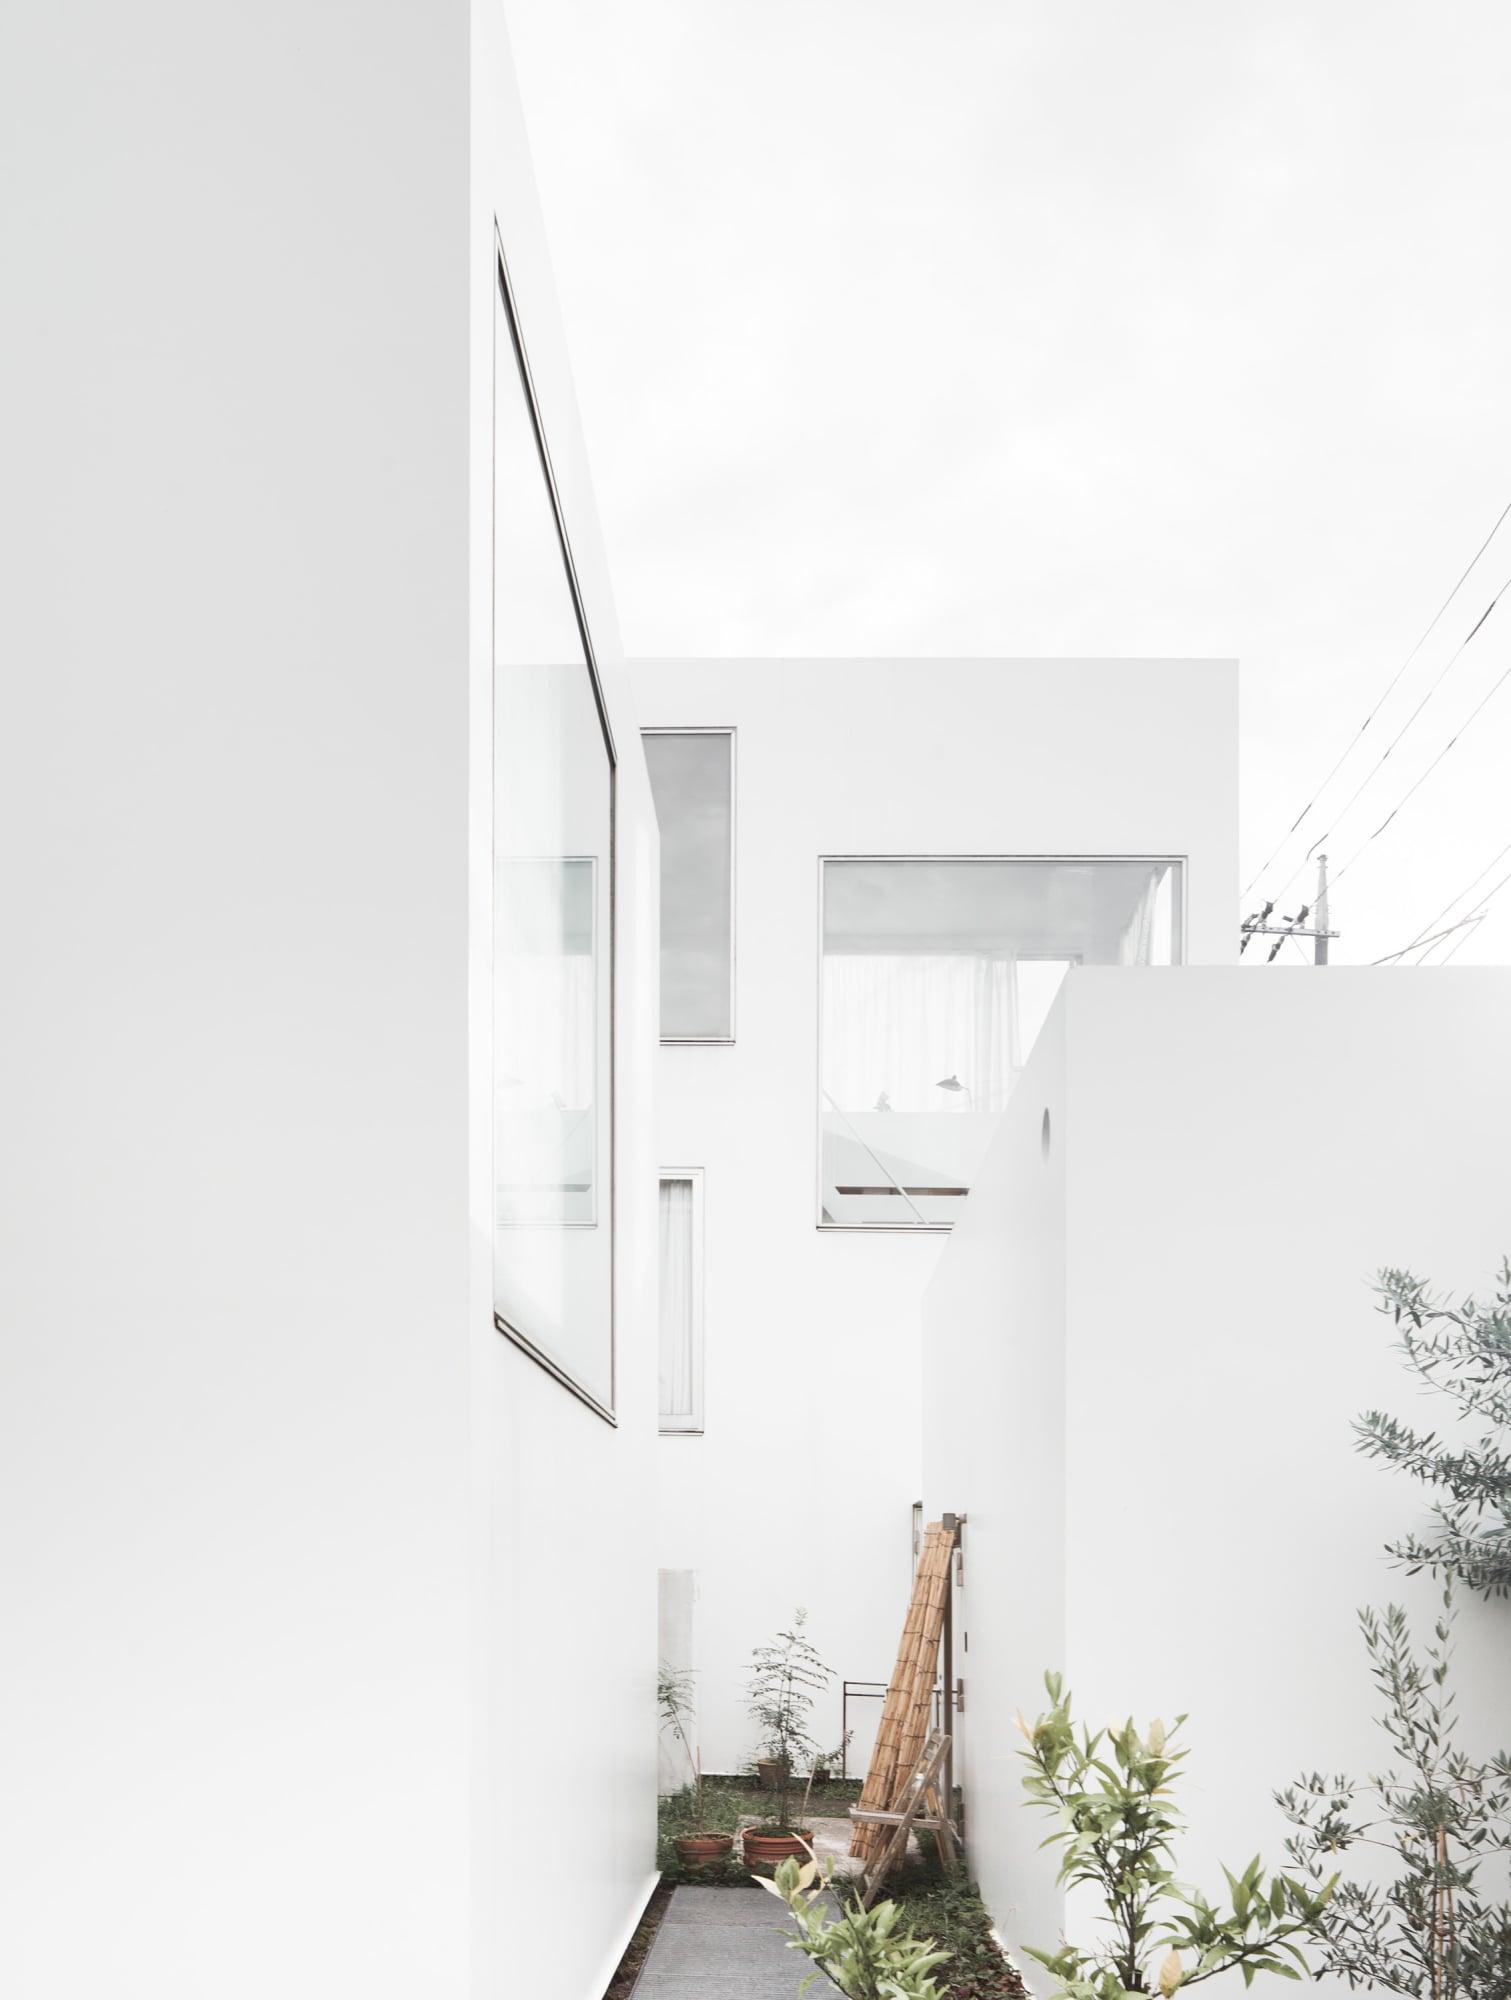 Picture of: Sanaa Kazuyo Sejima Ryue Nishizawa Jeroen Verrecht Moriyama House Divisare